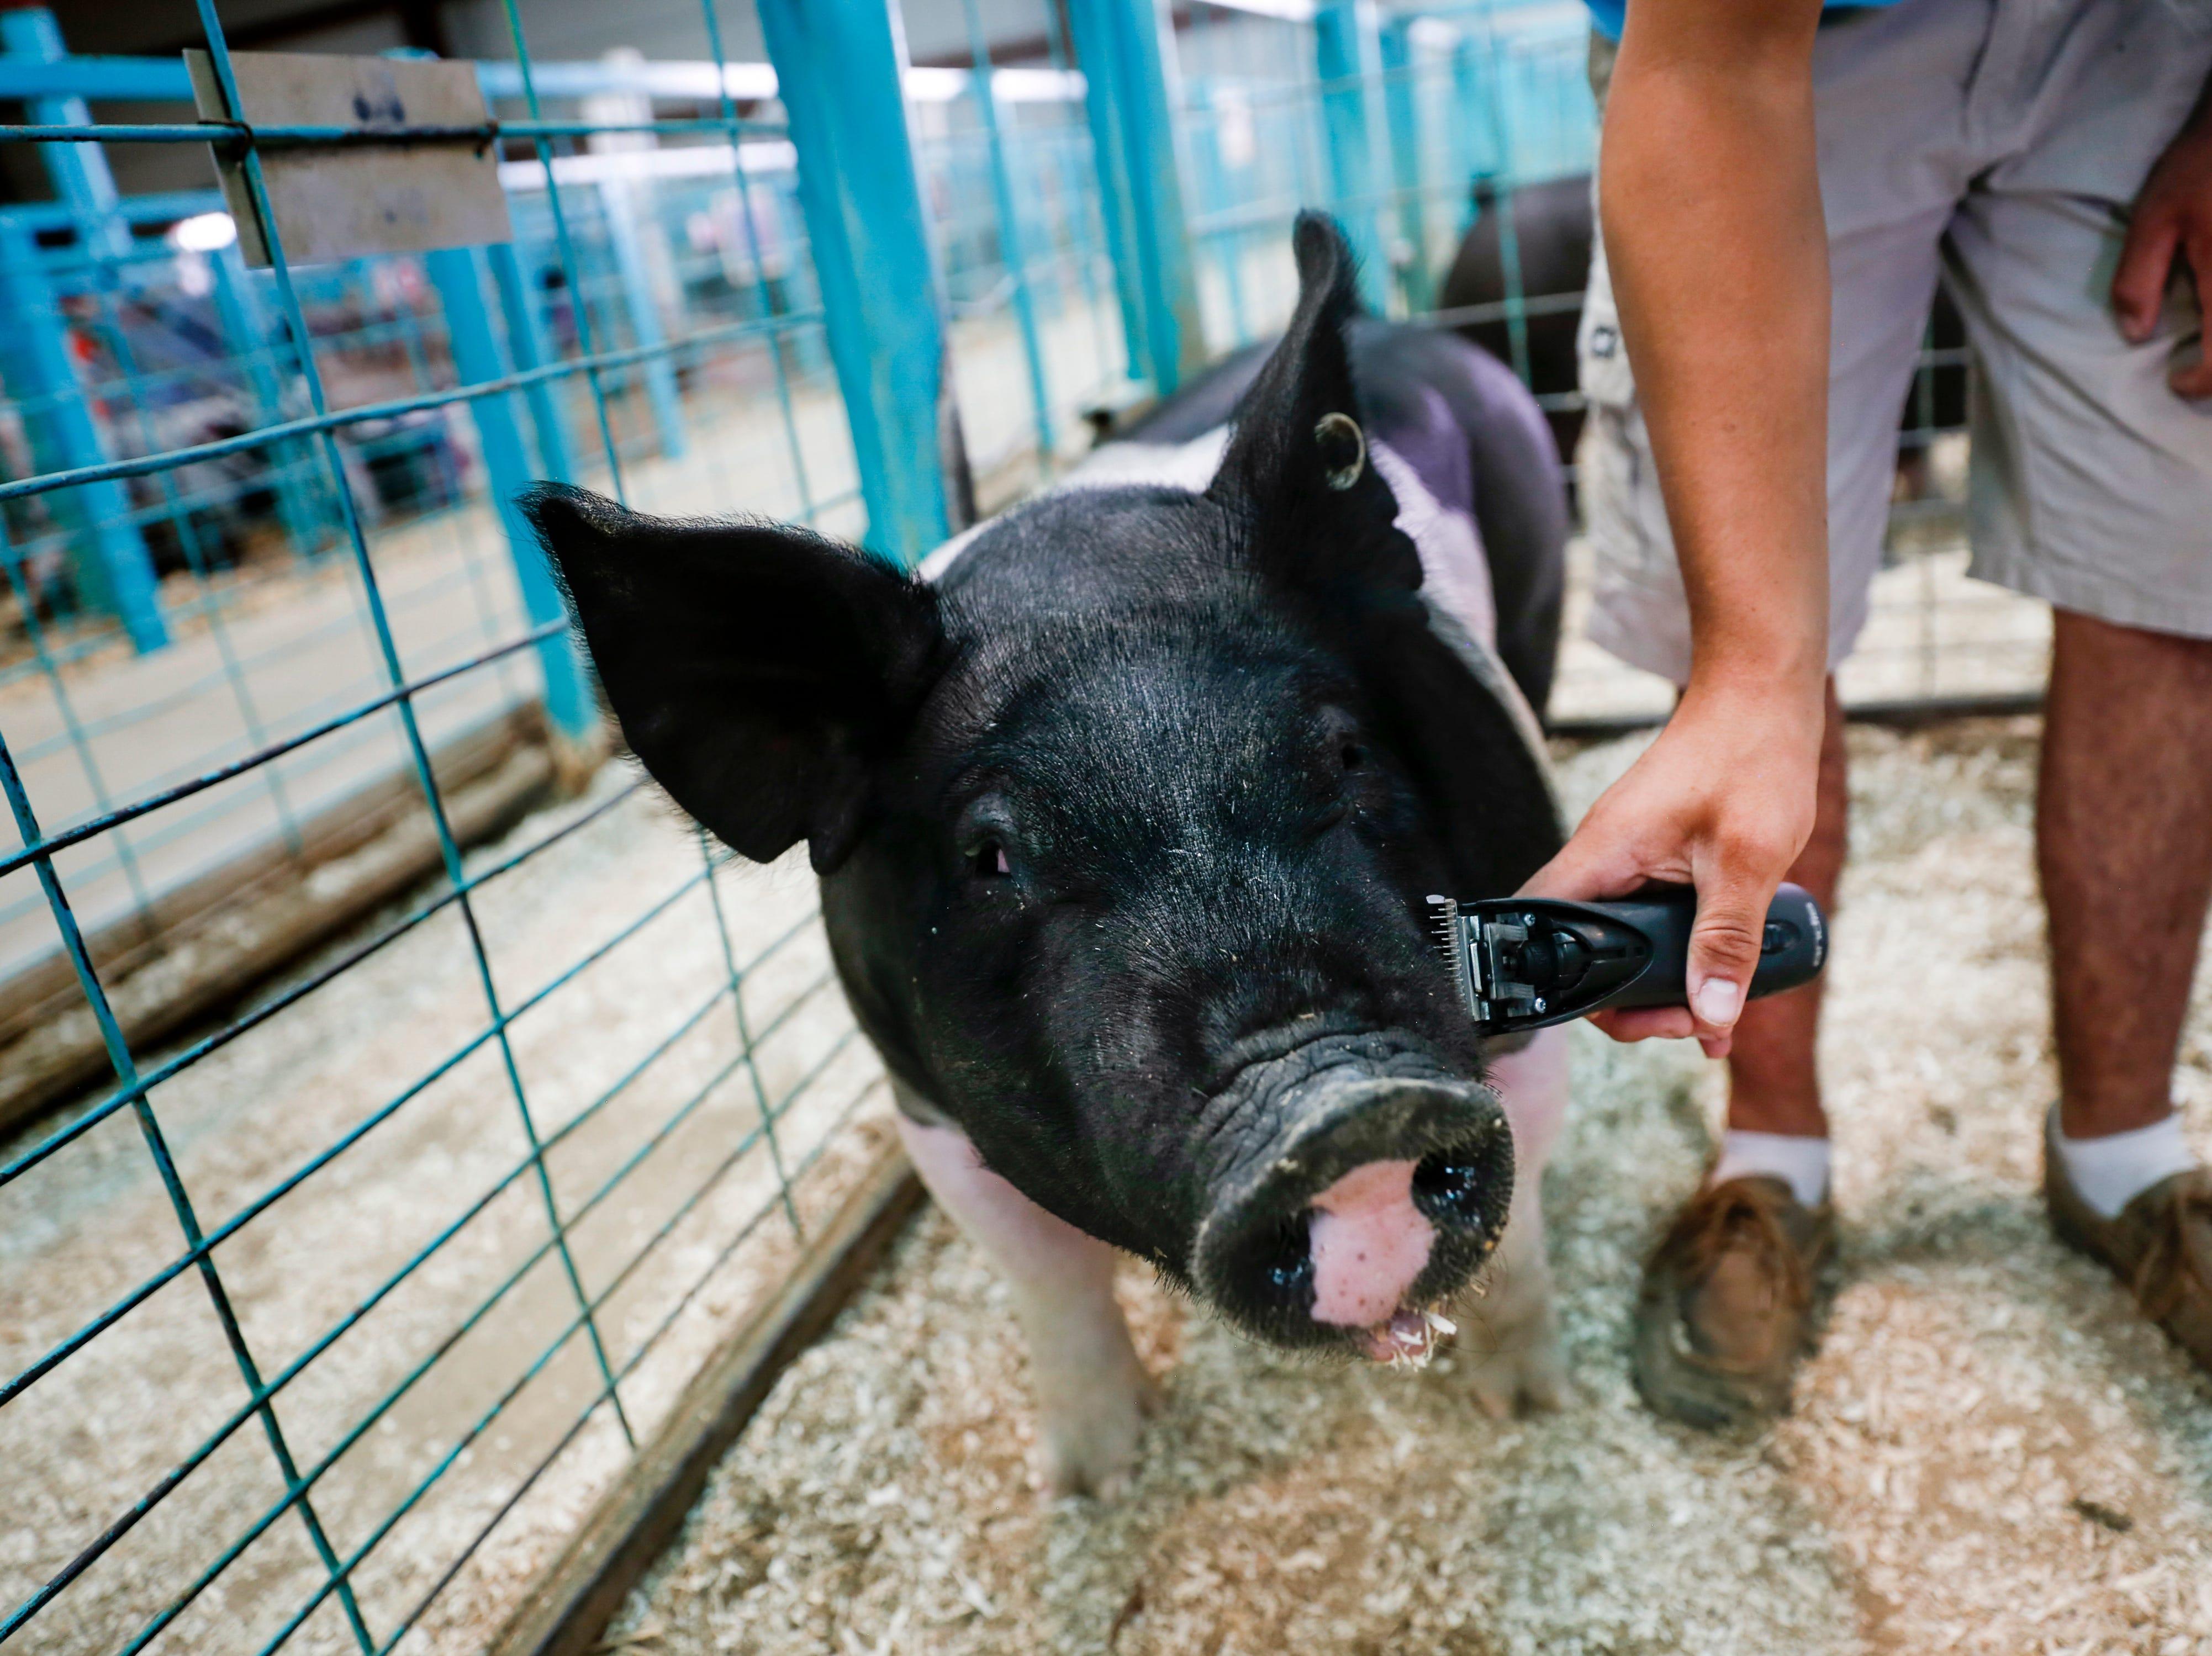 Ty Velasquez gives his hog Melman a shave, Tuesday, Aug. 14, 2018 at the San Juan County Fair at McGee Park in Farmington.